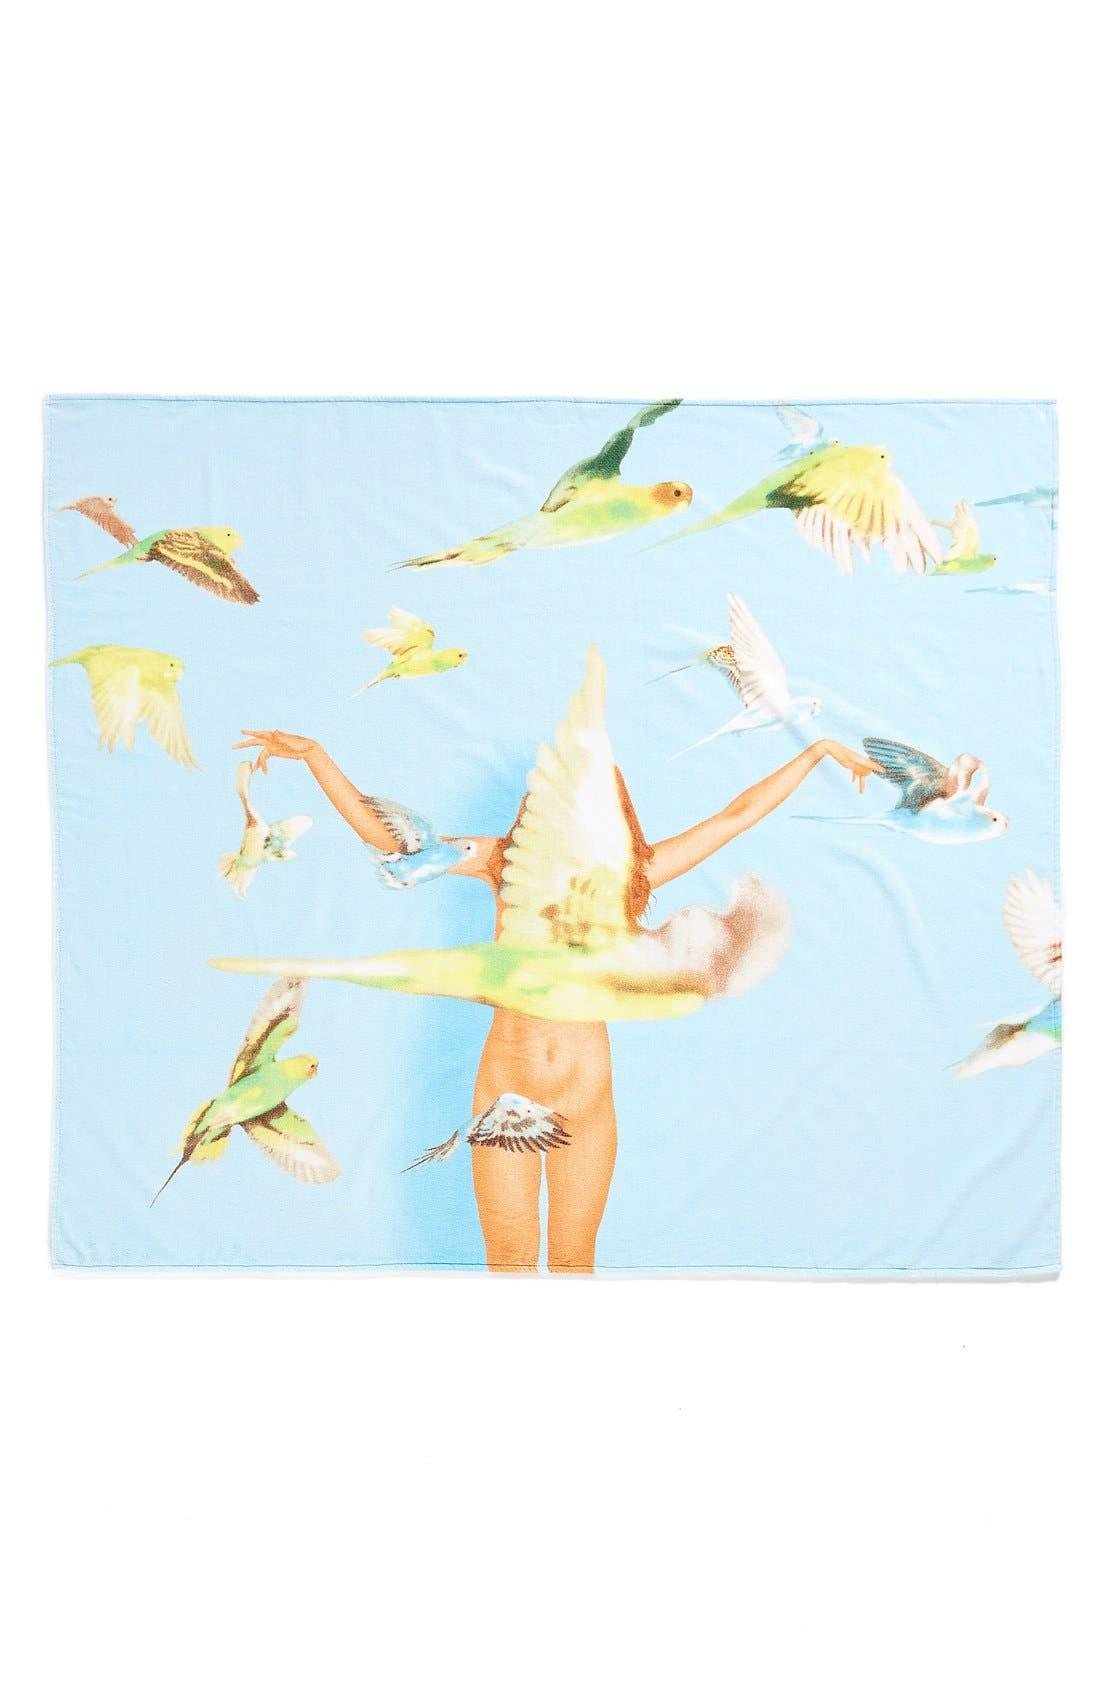 Alternate Image 1 Selected - Works on Whatever (WOW) 'Ryan McGinley' Beach Towel